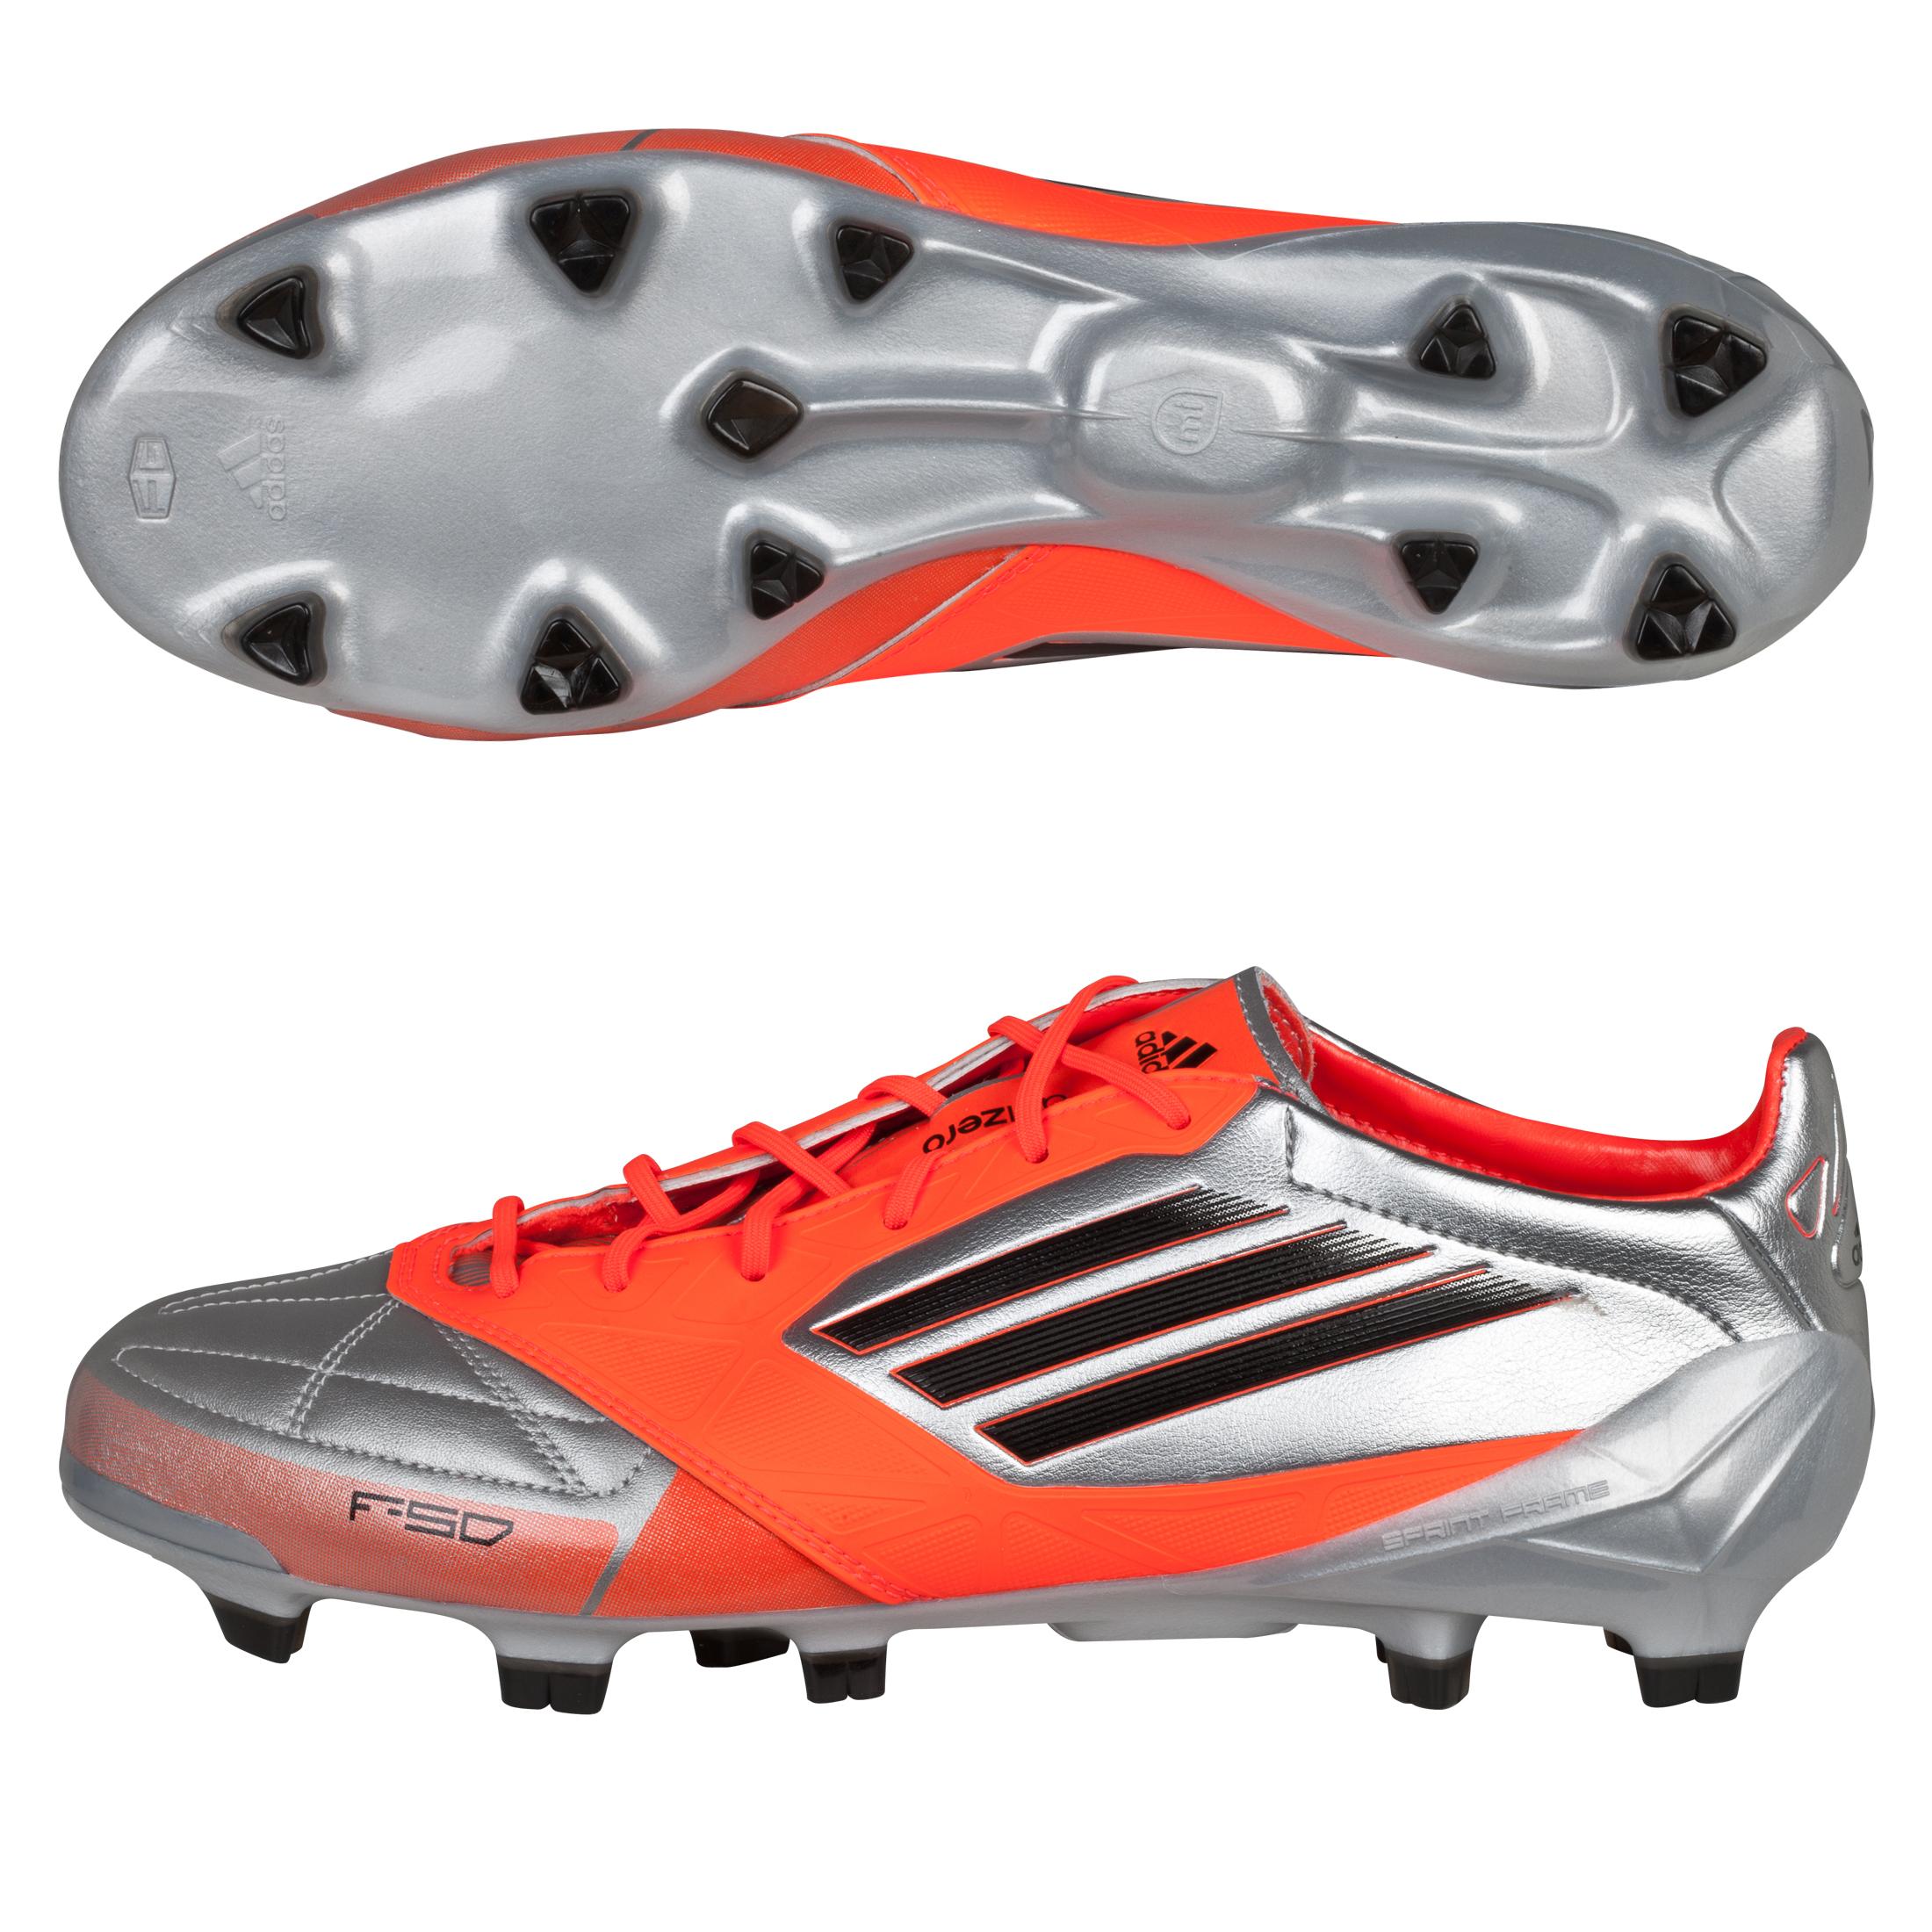 Adidas F50 Adizero TRX Firm Ground Leather Football Boots - Metallic Silver/Black/Infrared